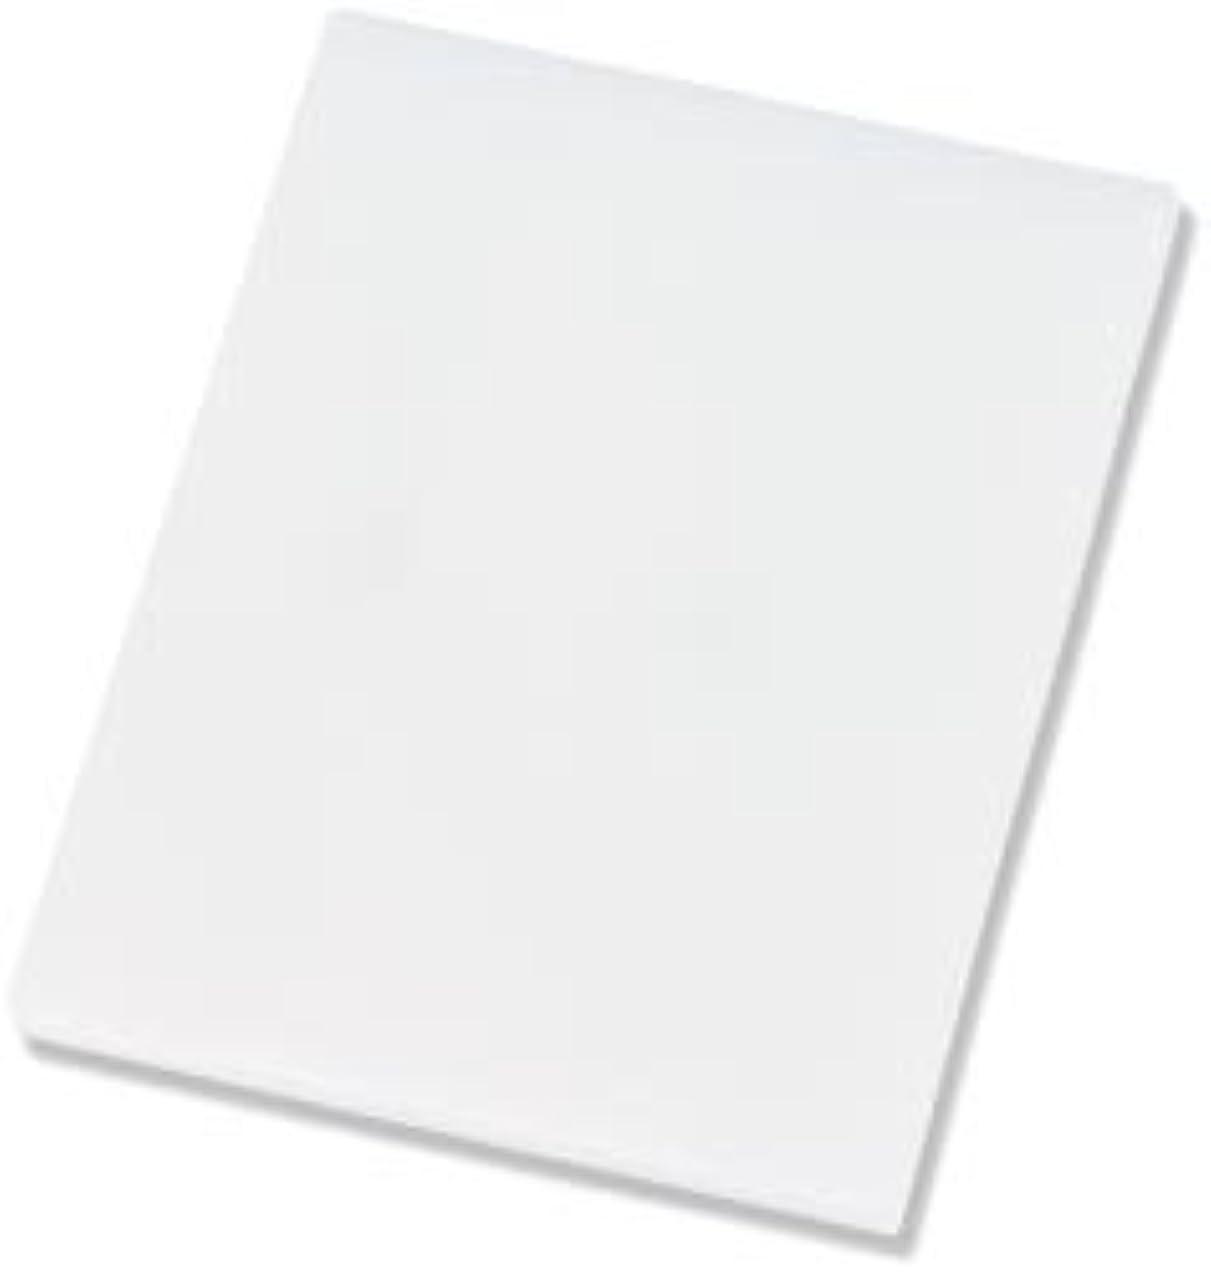 Bulk Buy: Sizzix Cutting Pad Standard 654557 (3-Pack)